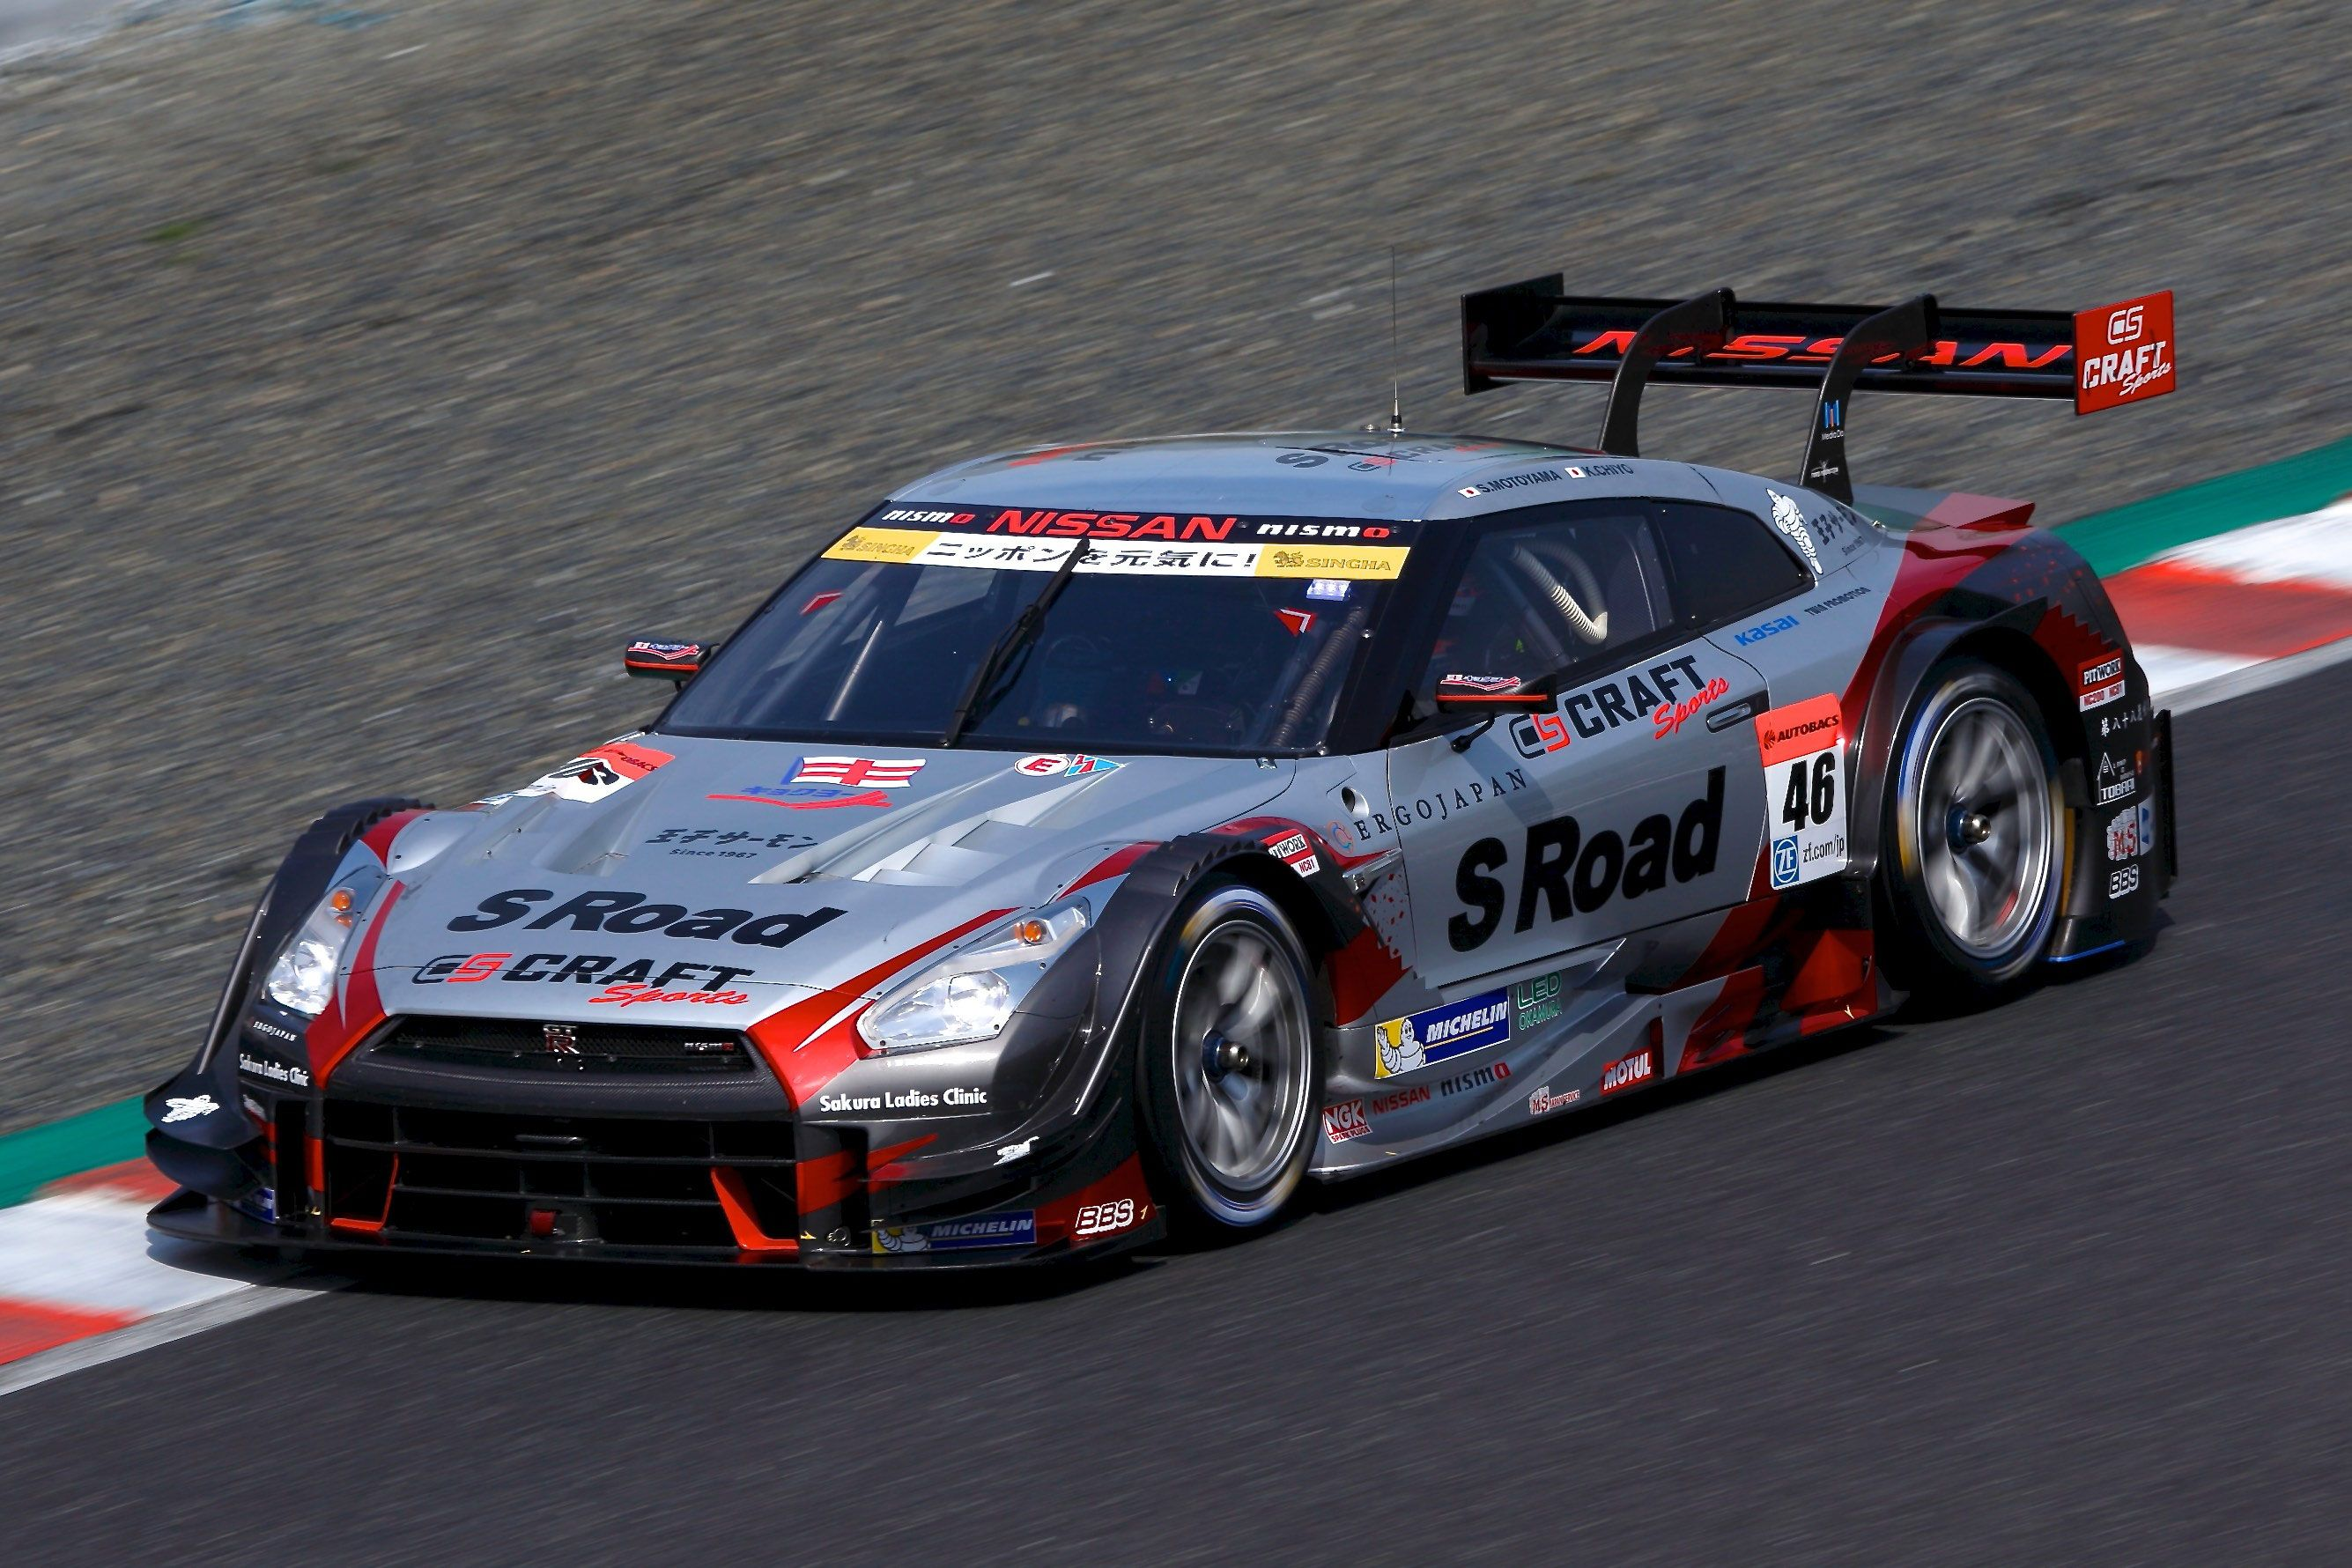 Image For 16 Nissan Gt R Super Gt Wallpaper レースカー 日産スカイライン 日産 Gtr